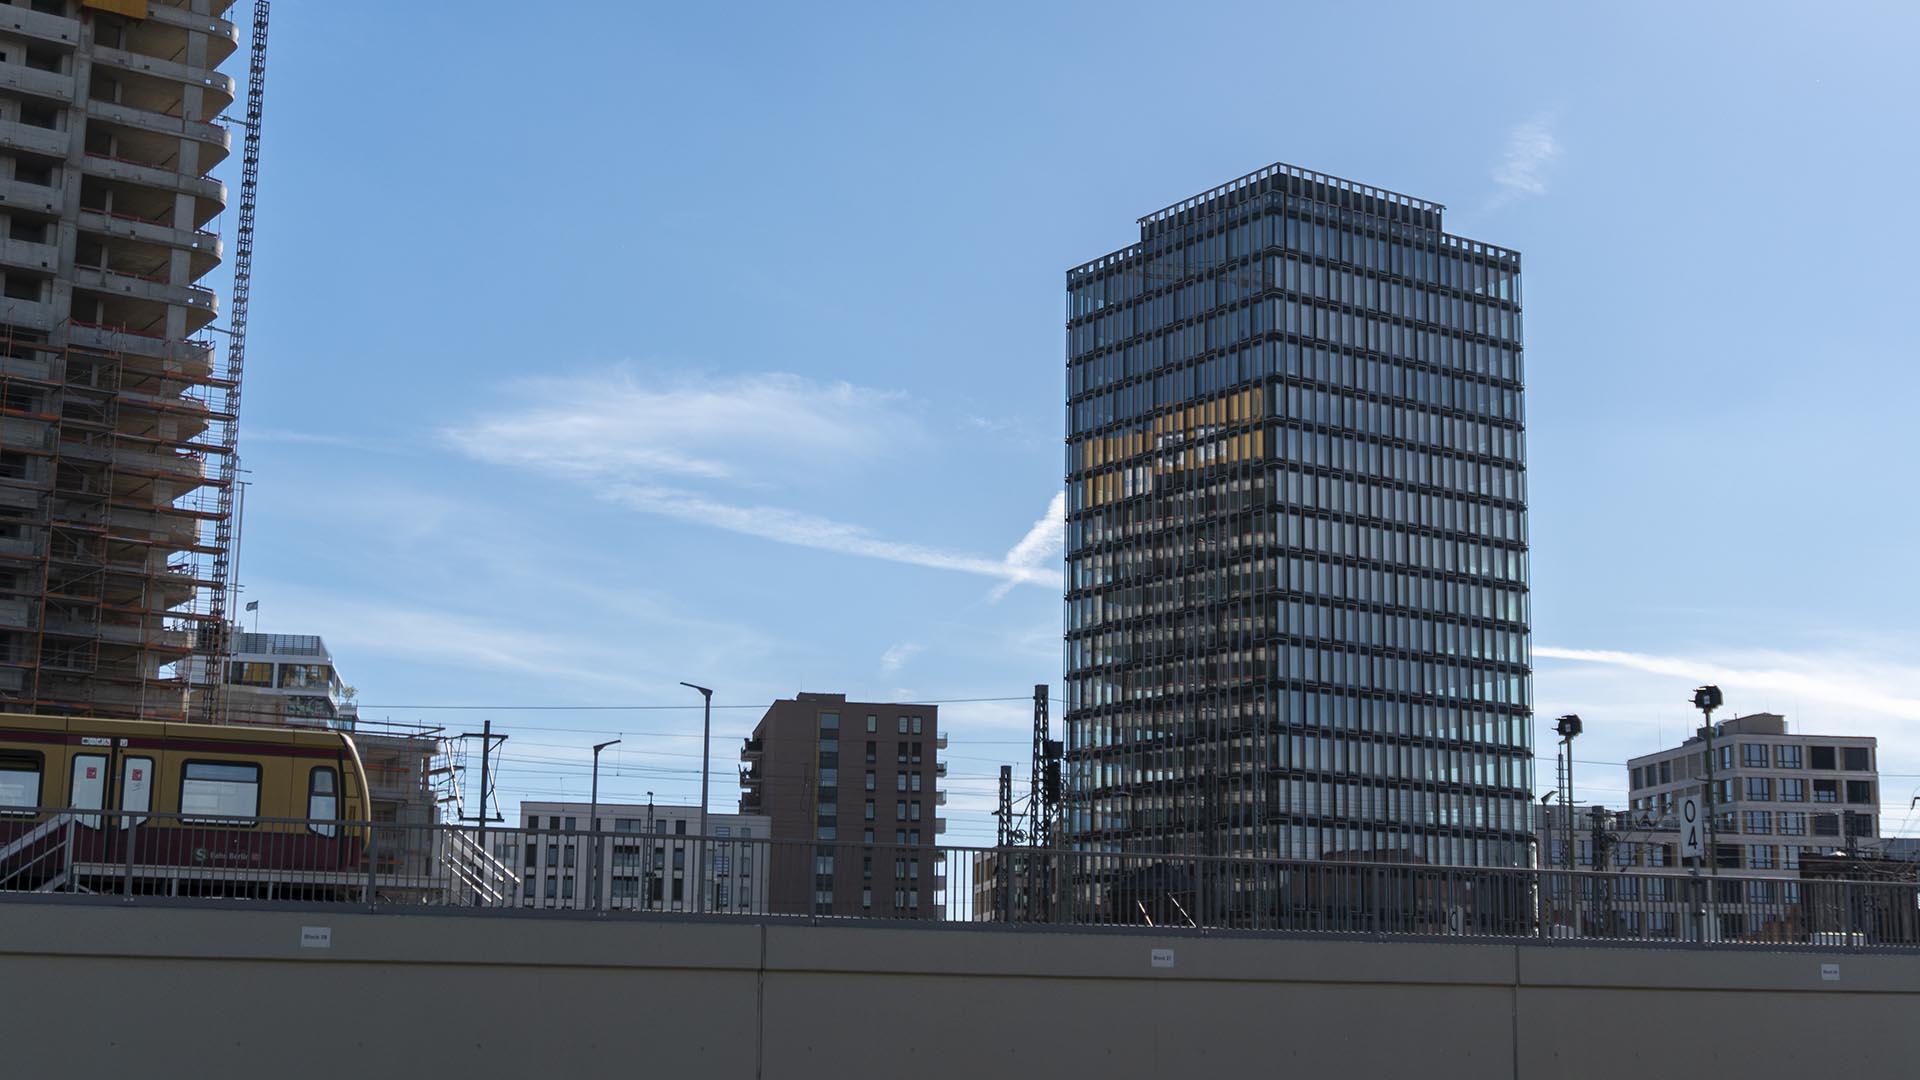 Spreeturm Hochhaus am Postbahnhof